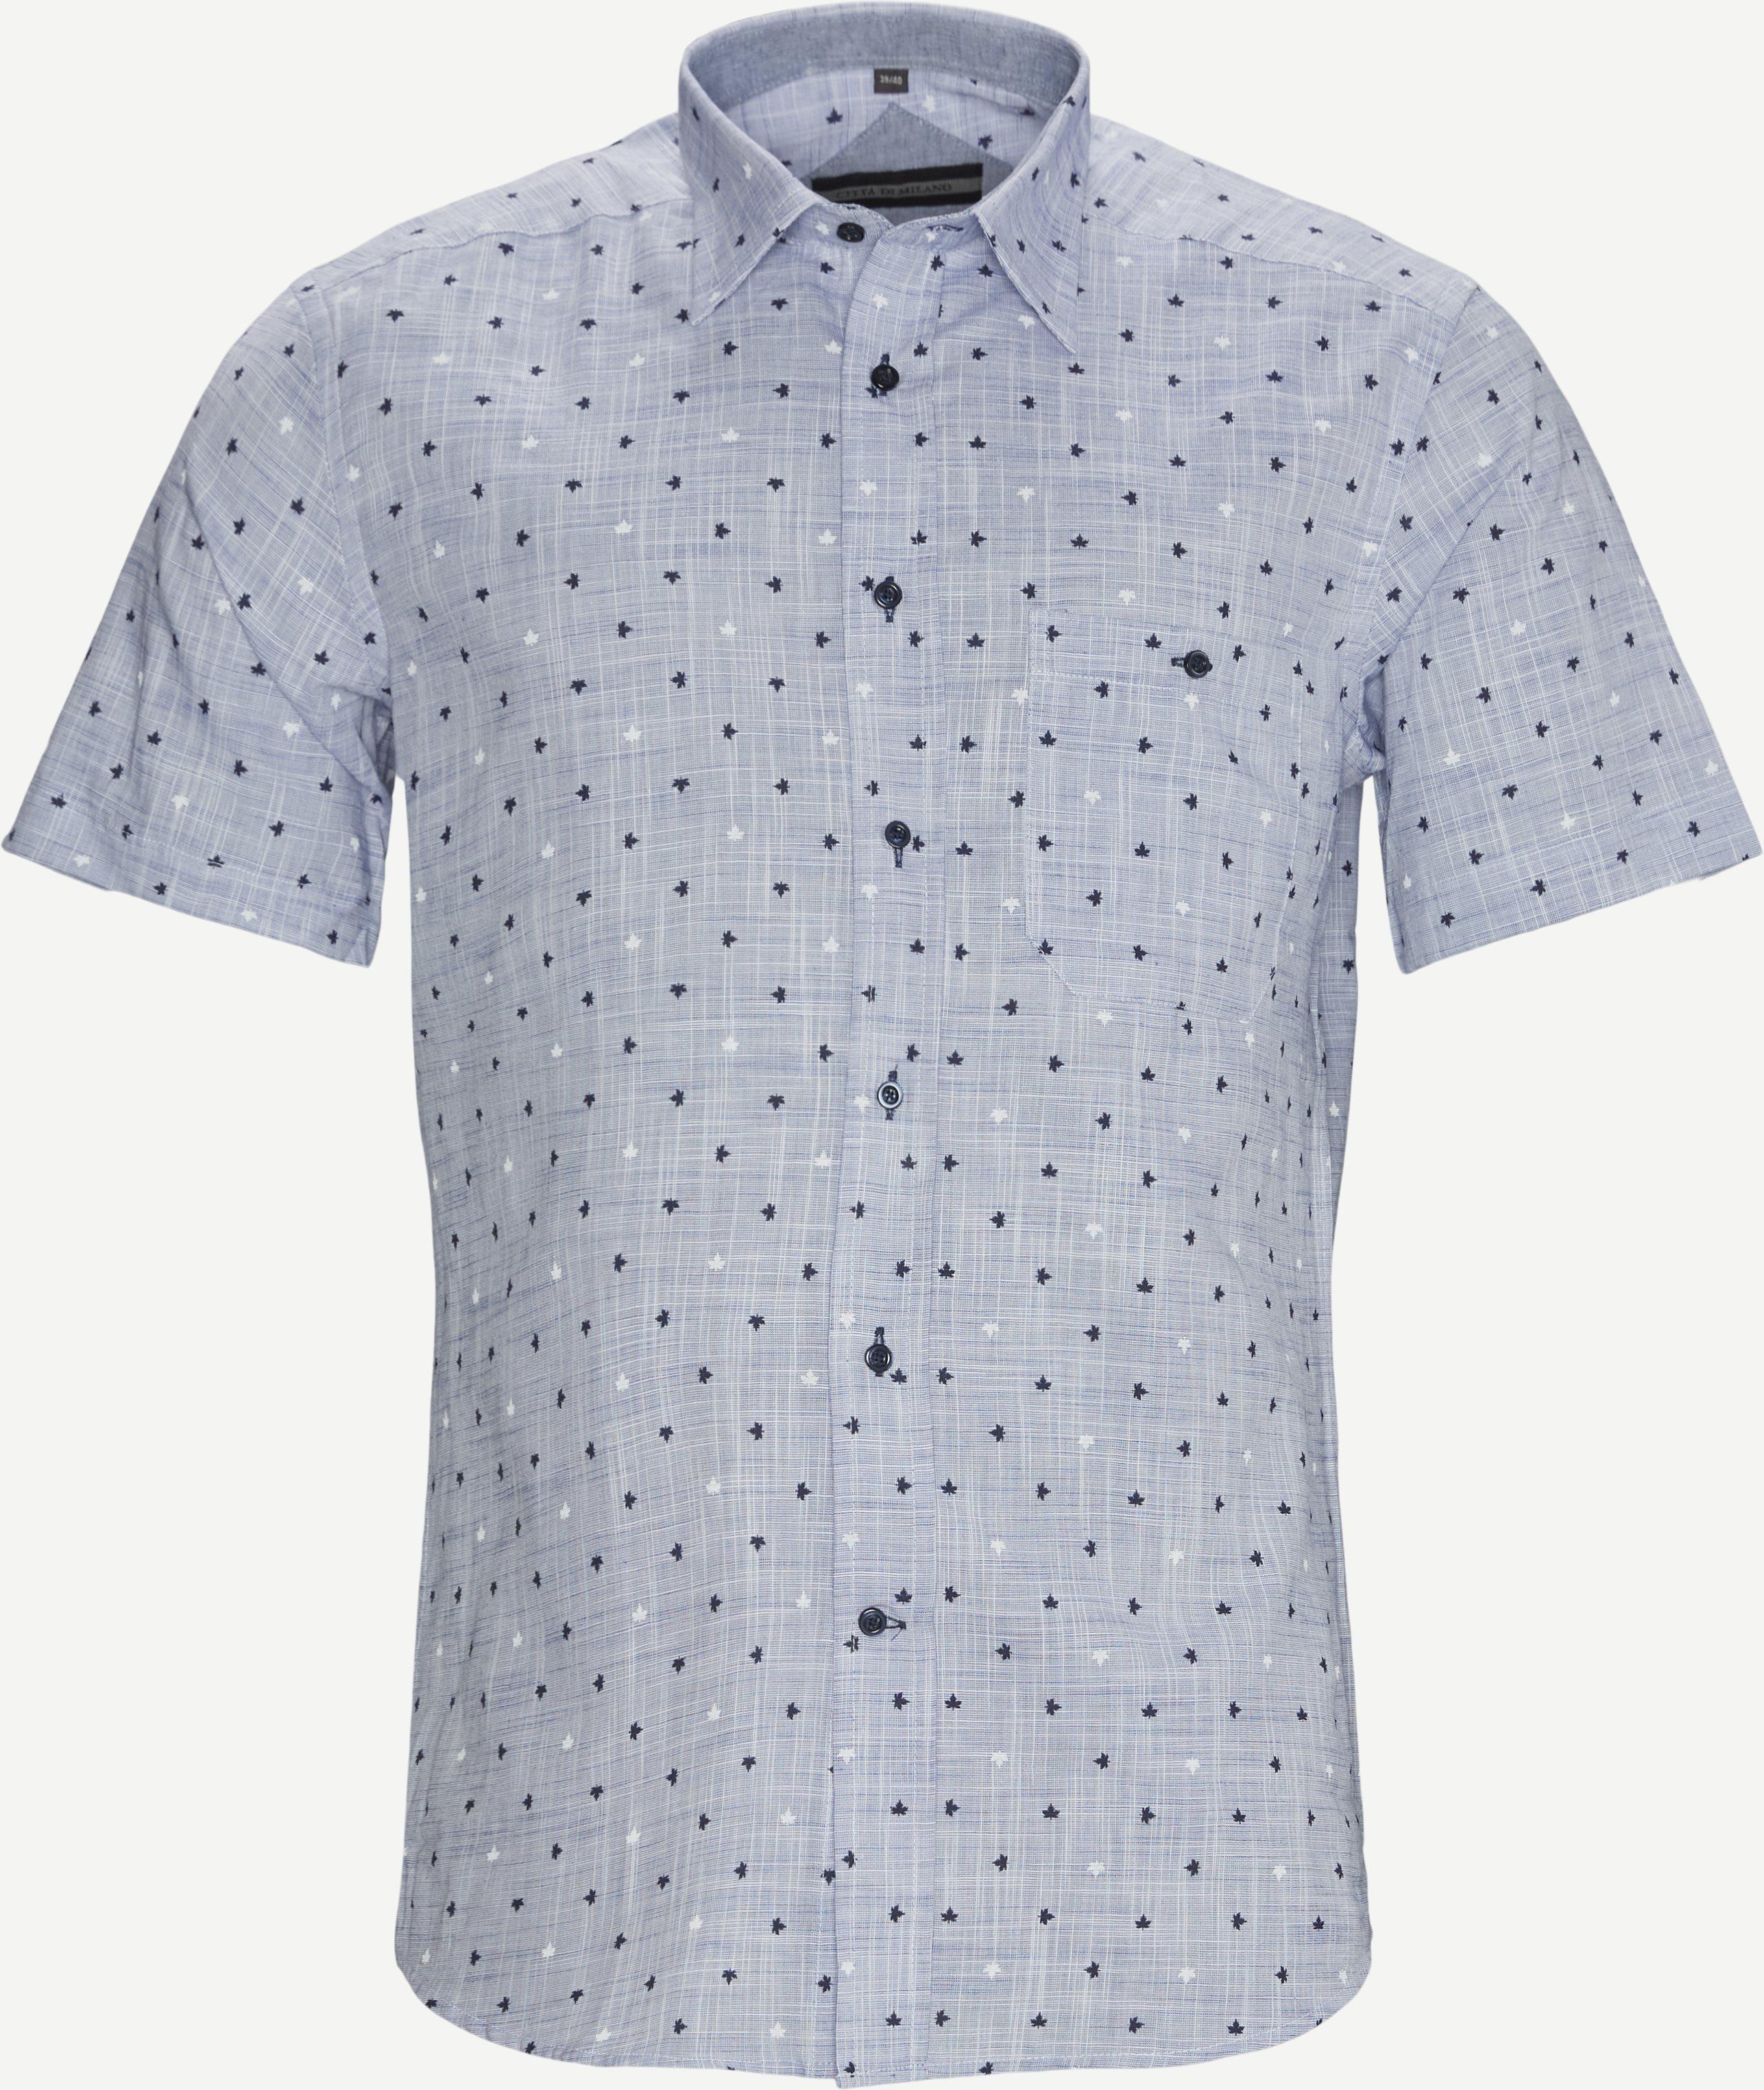 Kurzärmlige Hemden - Regular fit - Blau